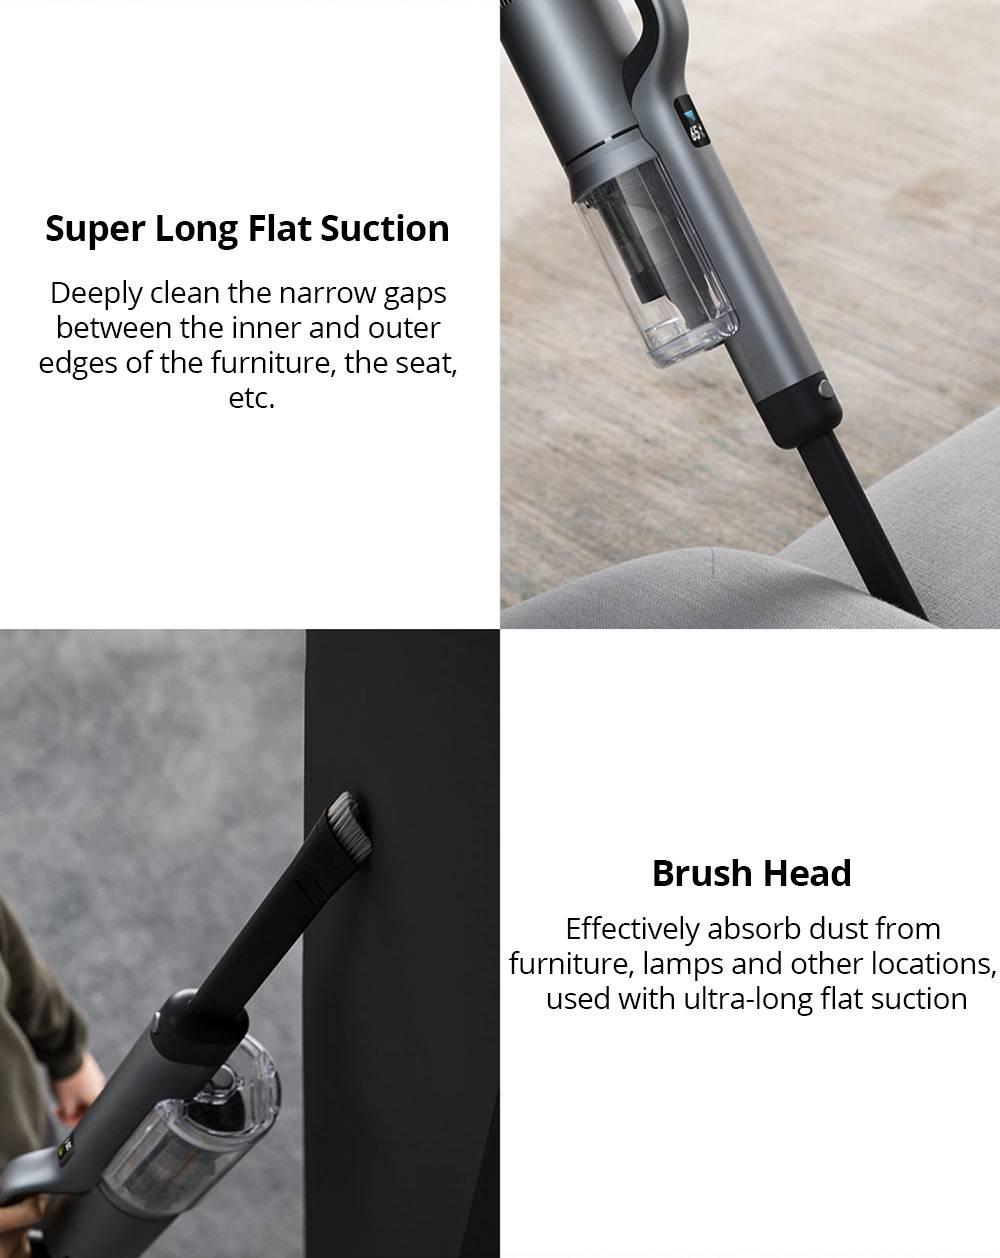 xiaomi roidmi nex 2 pro x30 handheld cordless vacuum cleaner (cn plug) -  geekmaxi.com  geekmaxi.com